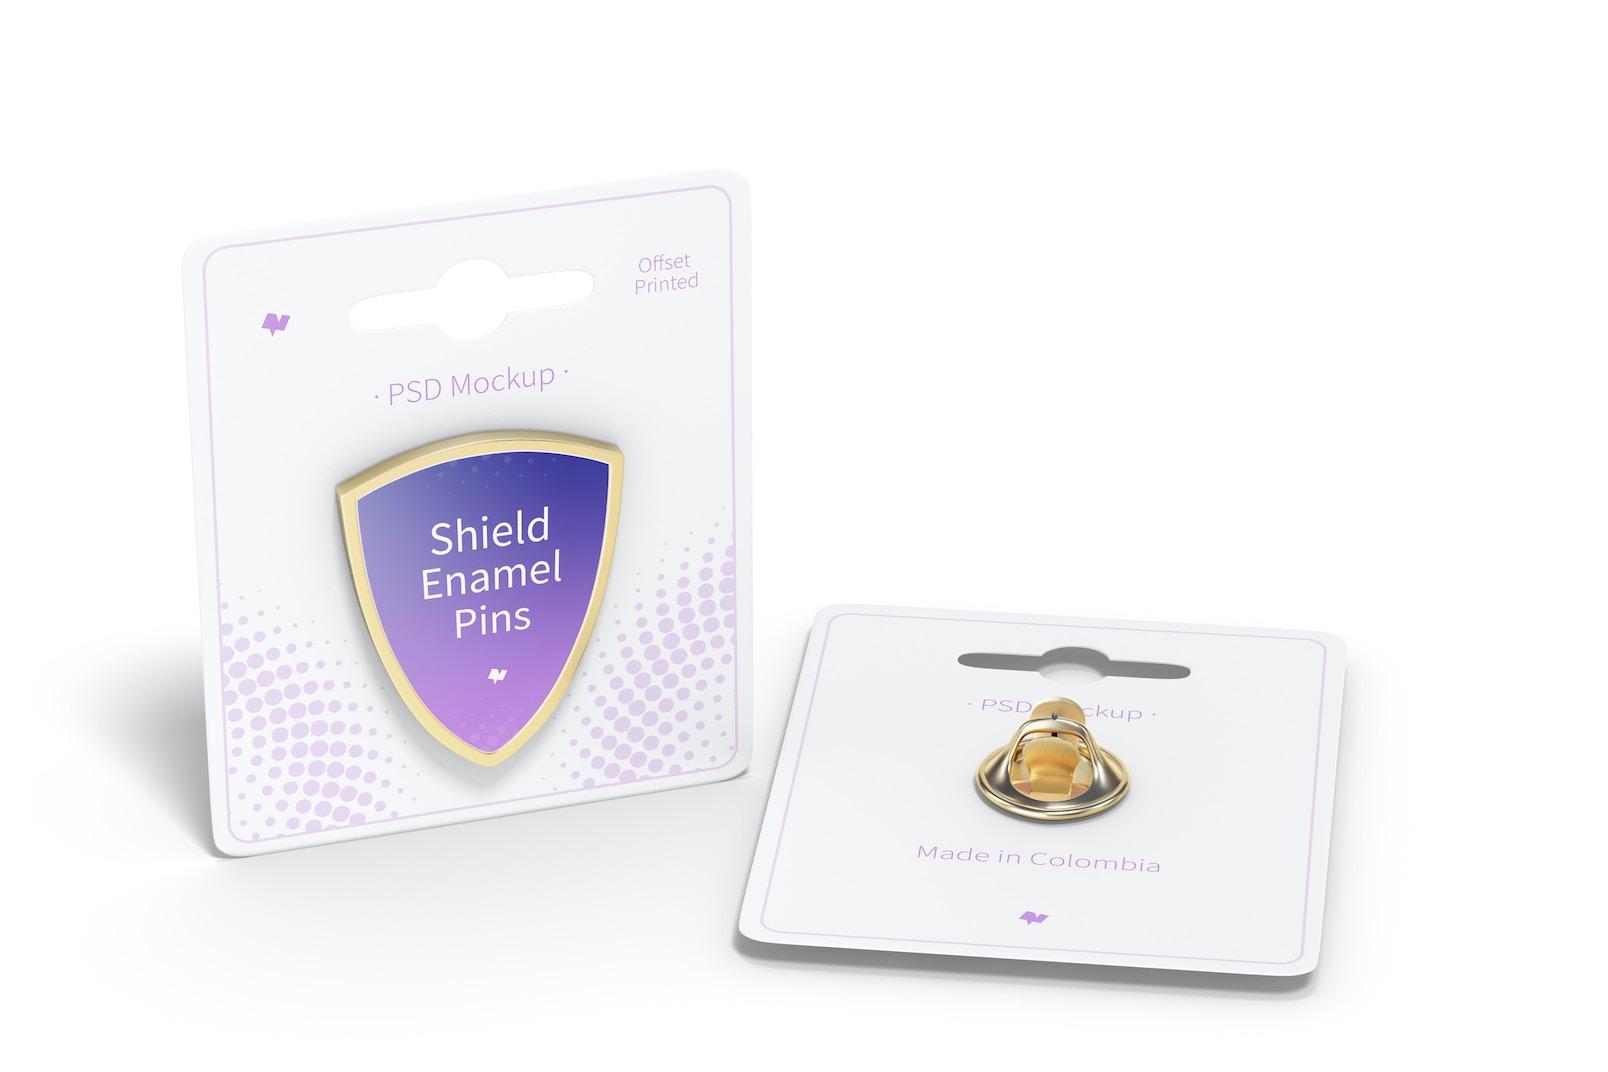 Shield Enamel Pin Mockup, Perspective